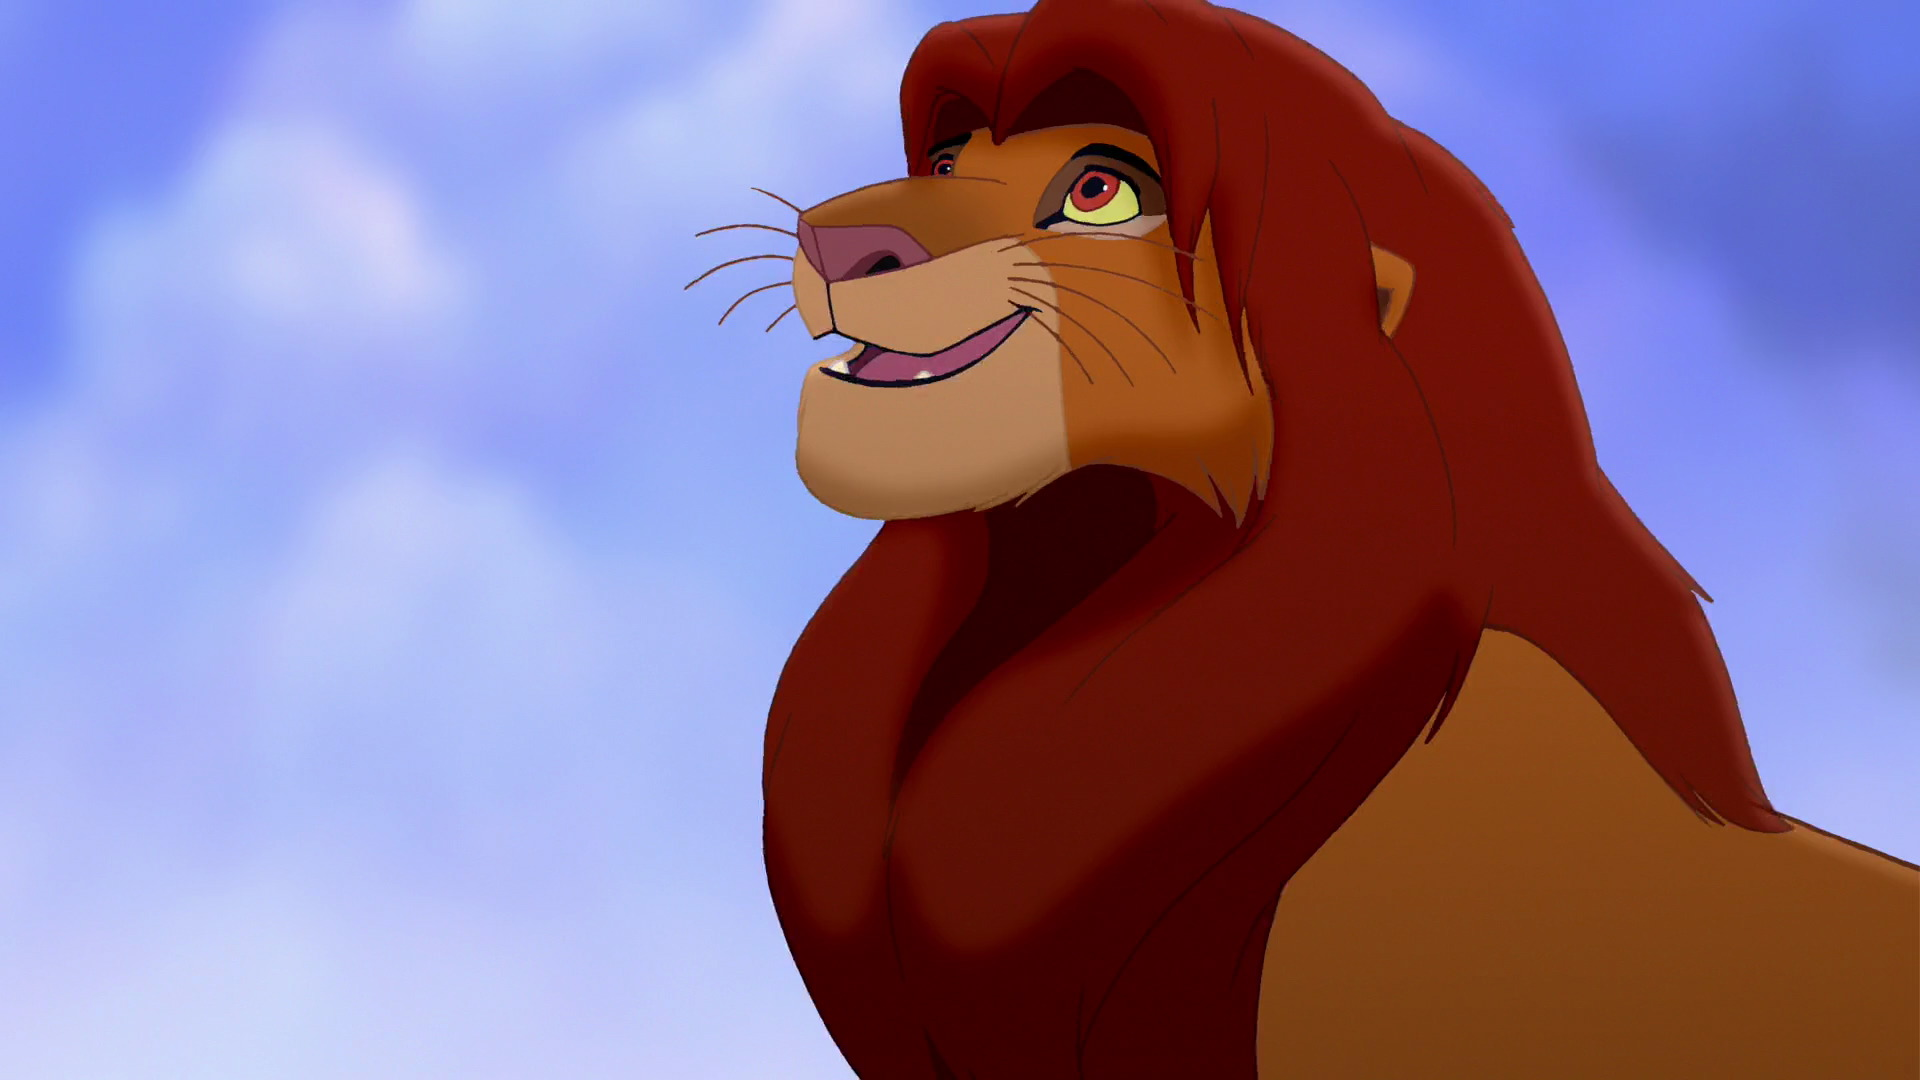 mis quejas de la nueva serie el leon guardian Lion-king2-disneyscreencaps.com-223